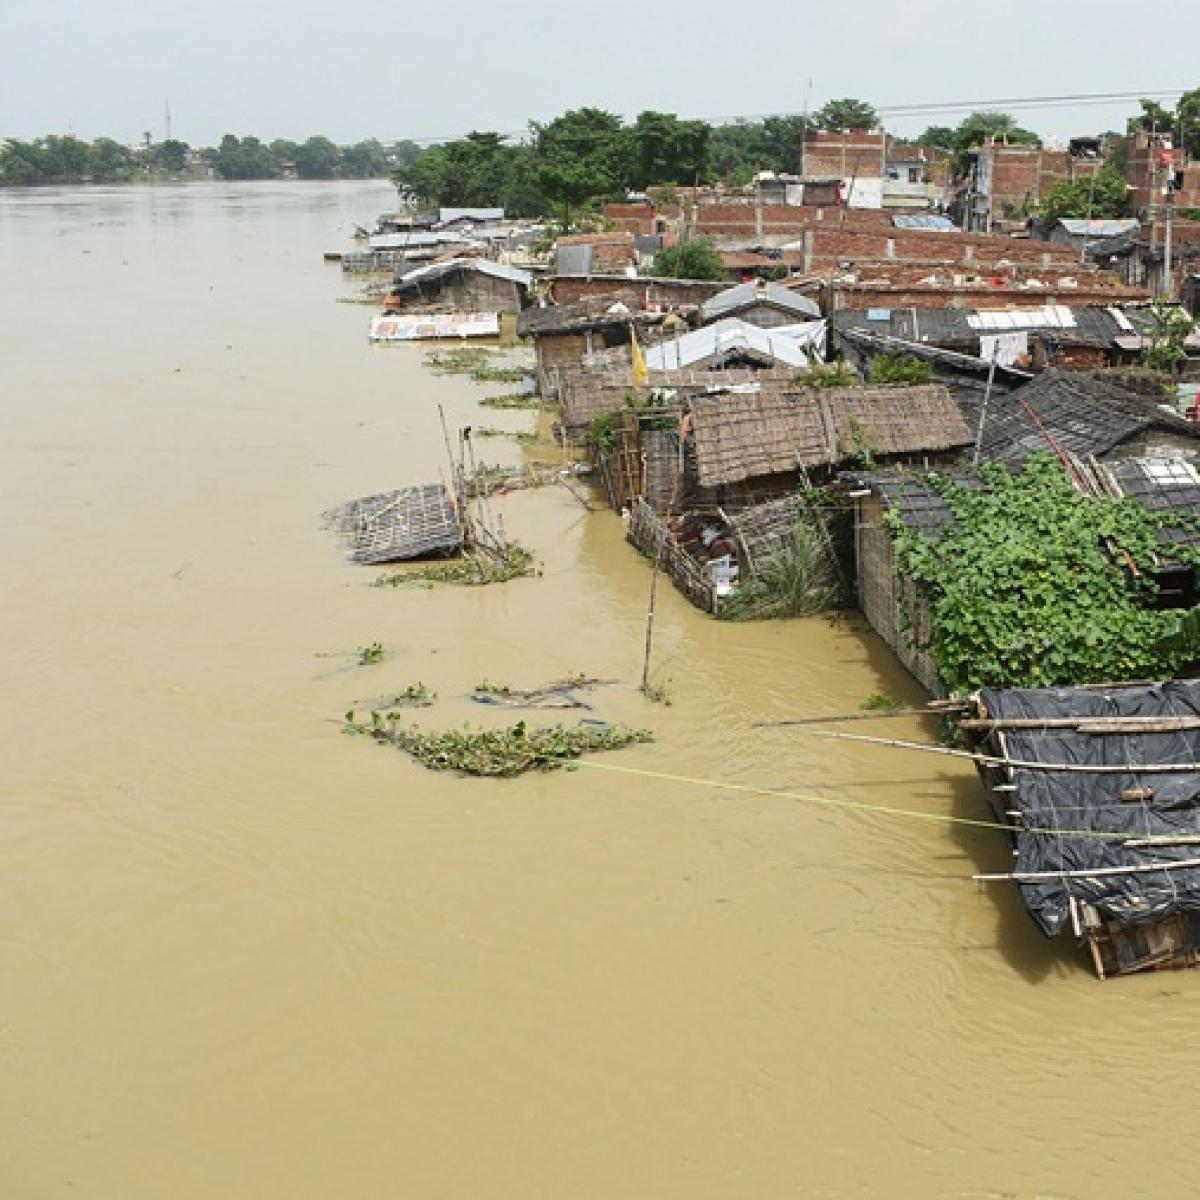 Flood death toll rises to 97 in Assam, Bihar; 3 killed in Uttar Pradesh in rain-related incident